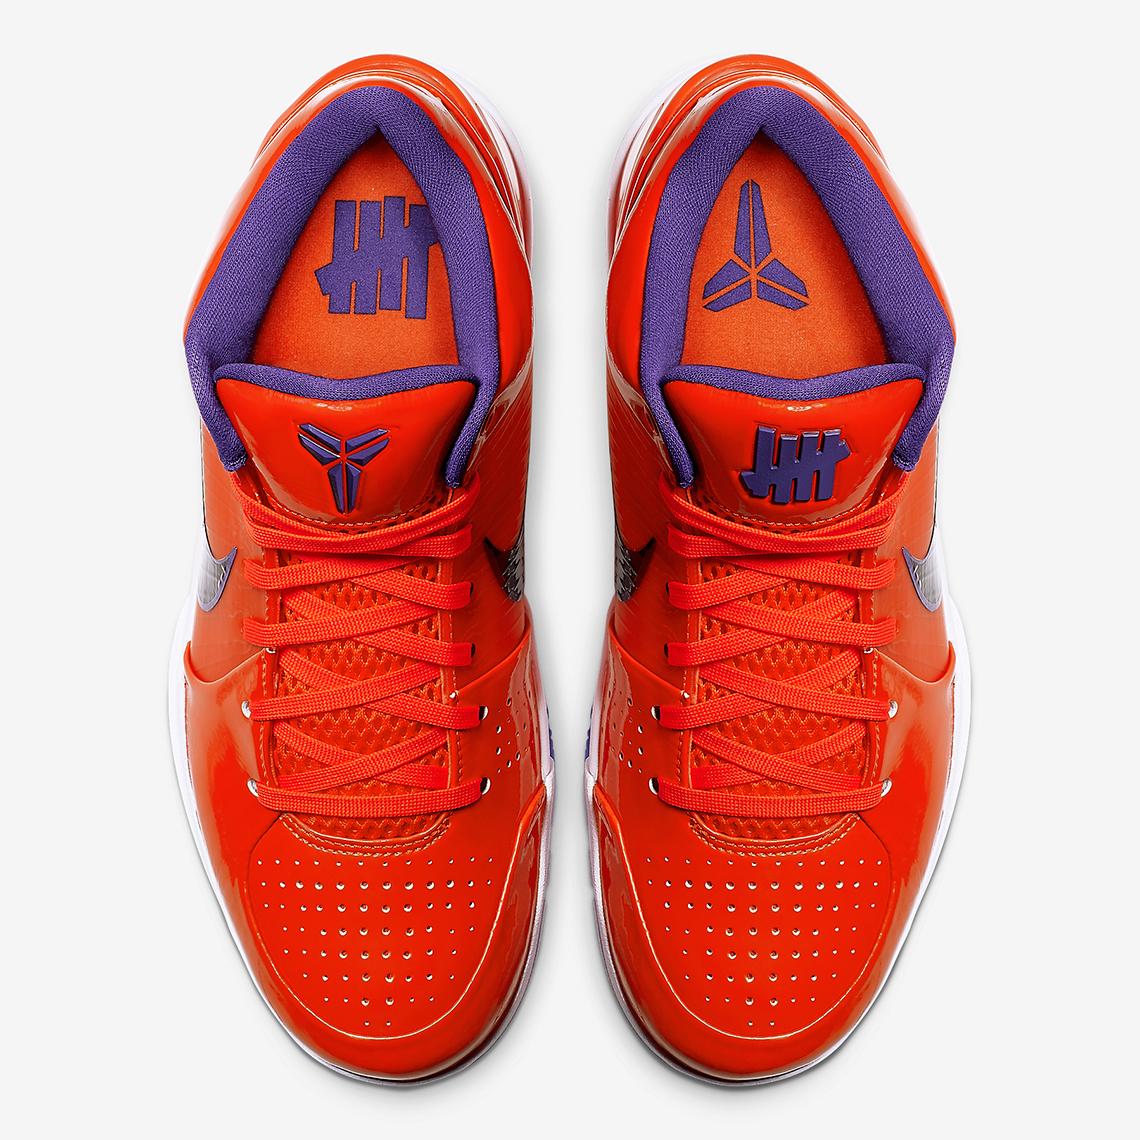 best authentic 61ec2 32b48 Undefeated Nike Kobe 4 Protro Devin Booker CQ3869-800 ...